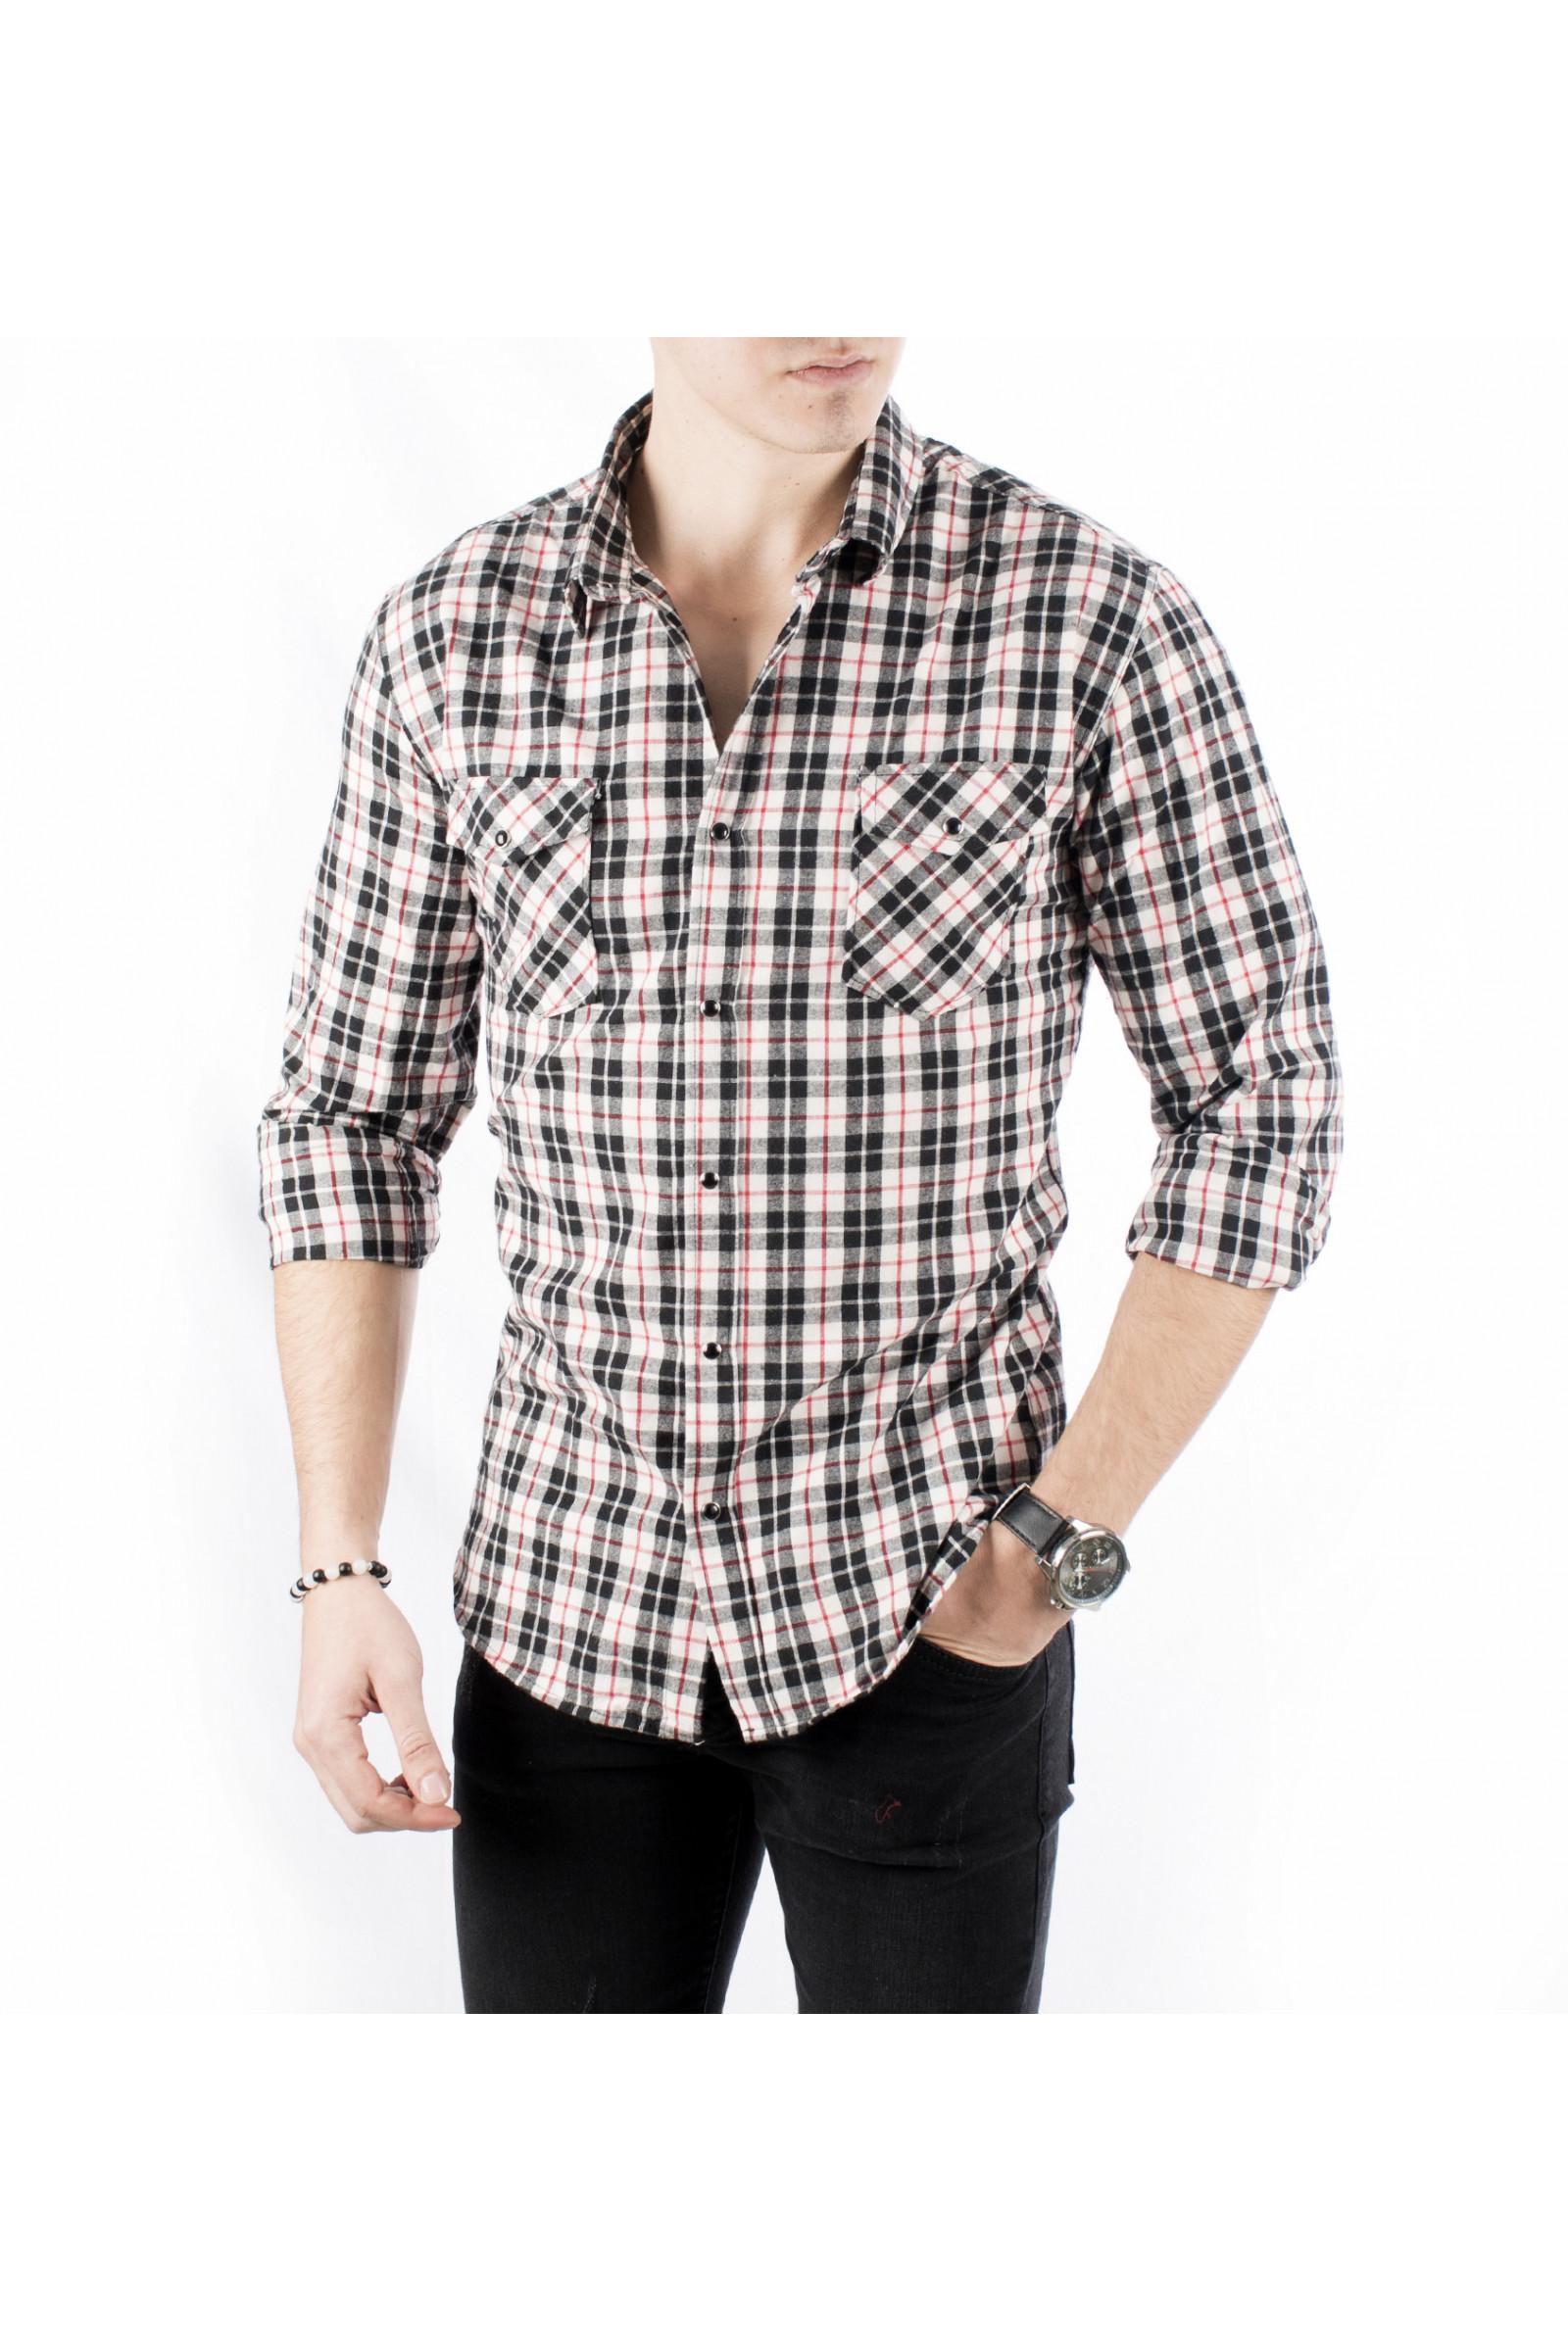 71674ef0bba DeepSEA Italian Cut Pockets Covered Gabardine Men s Shirt 1801844